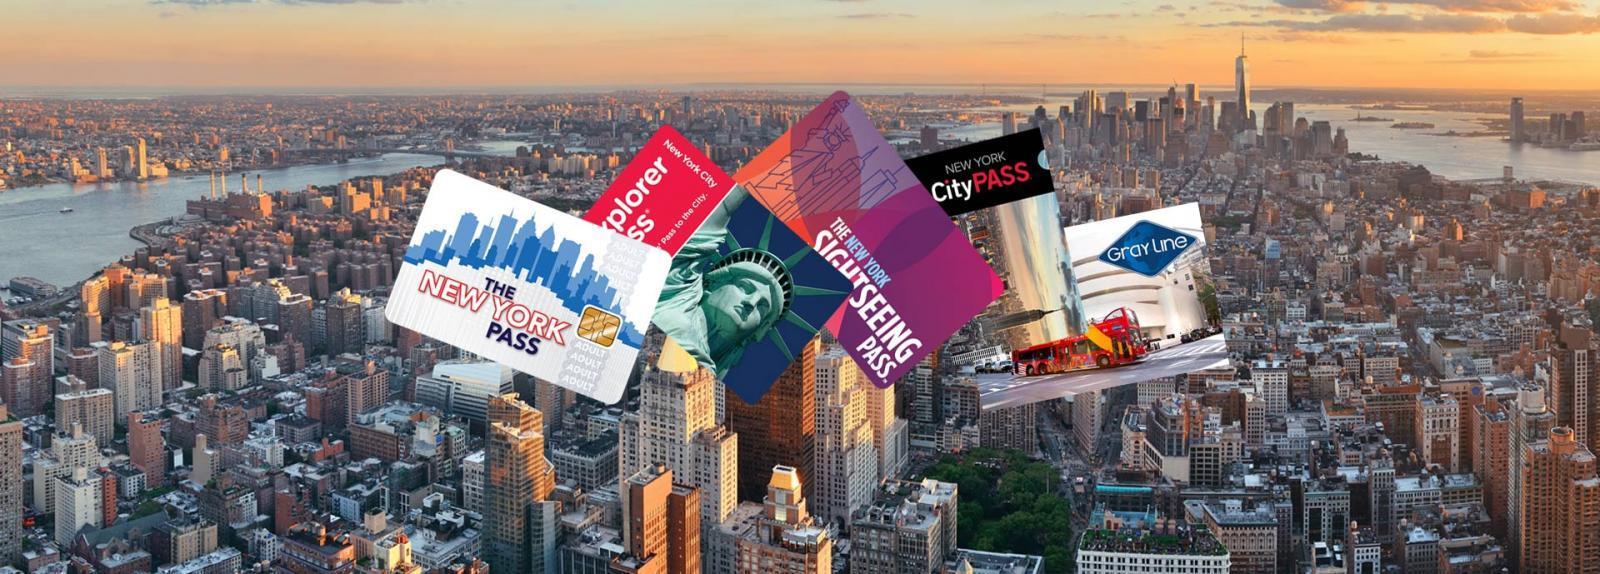 New York Pass Erfahrungen: welcher New York Pass ist der Beste?